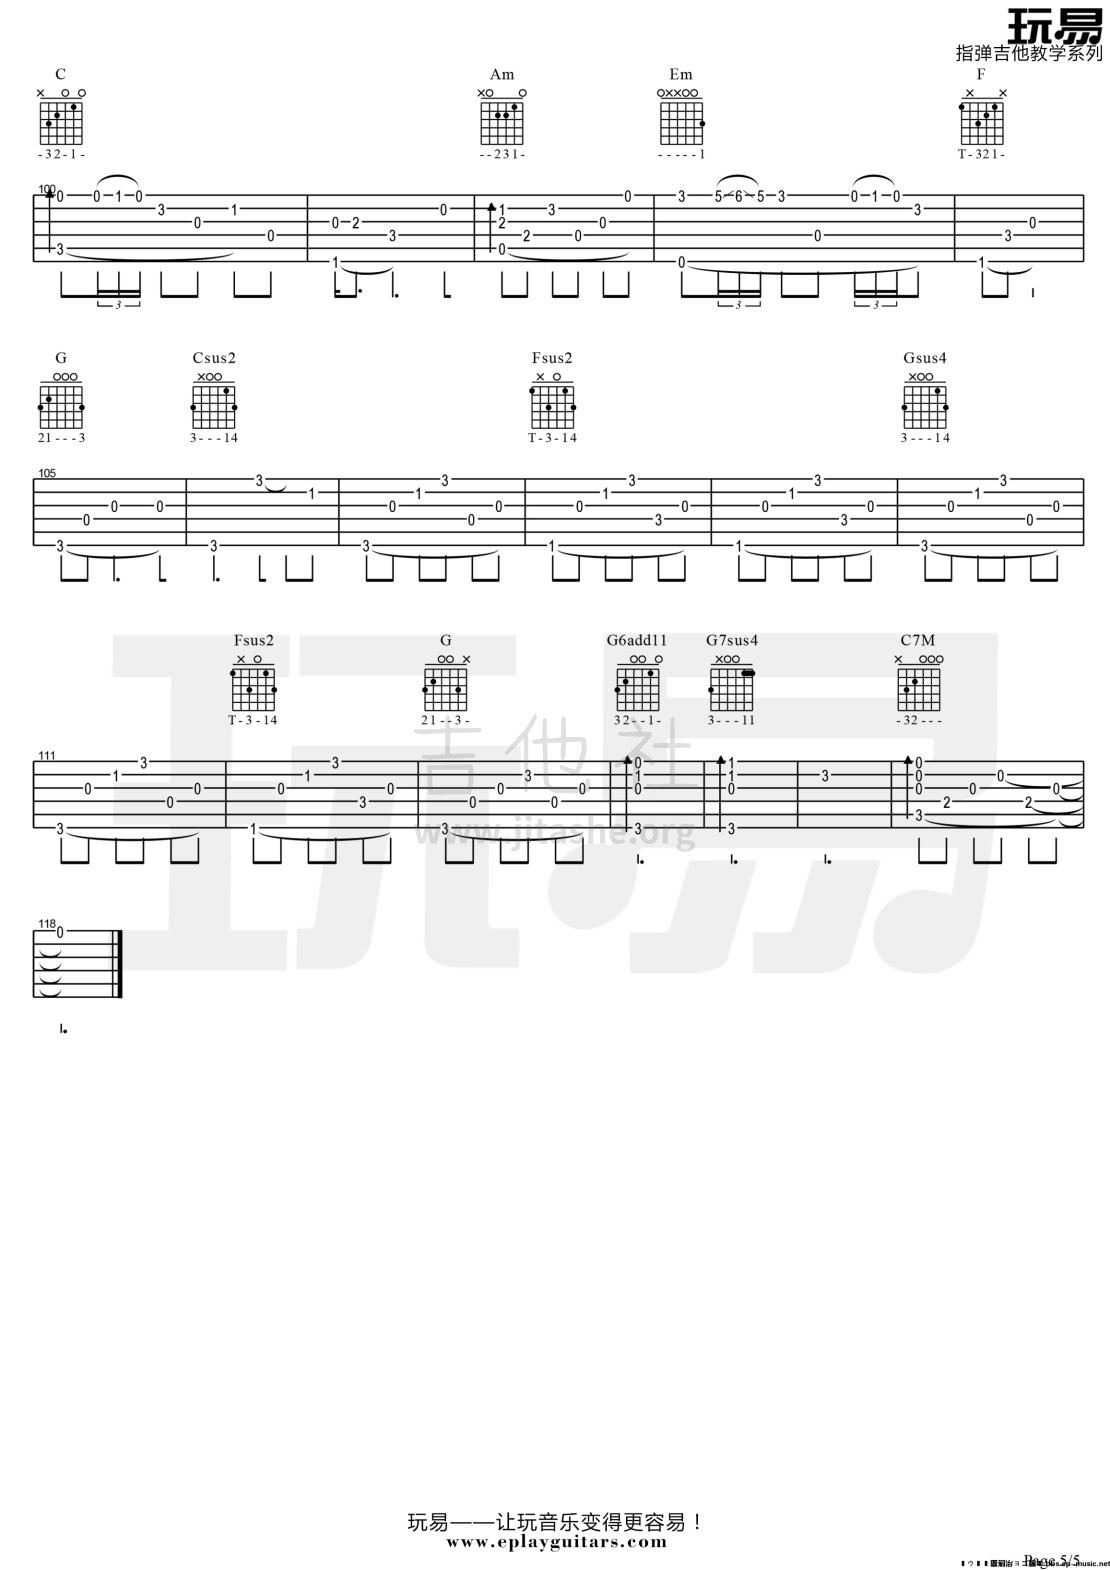 The Immigrant(玩易指弹吉他教学系列)吉他谱(图片谱,指弹,教学,玩易指弹教学)_Joanie Madden(乔妮·梅登)_The  lmmigrant 5.jpg